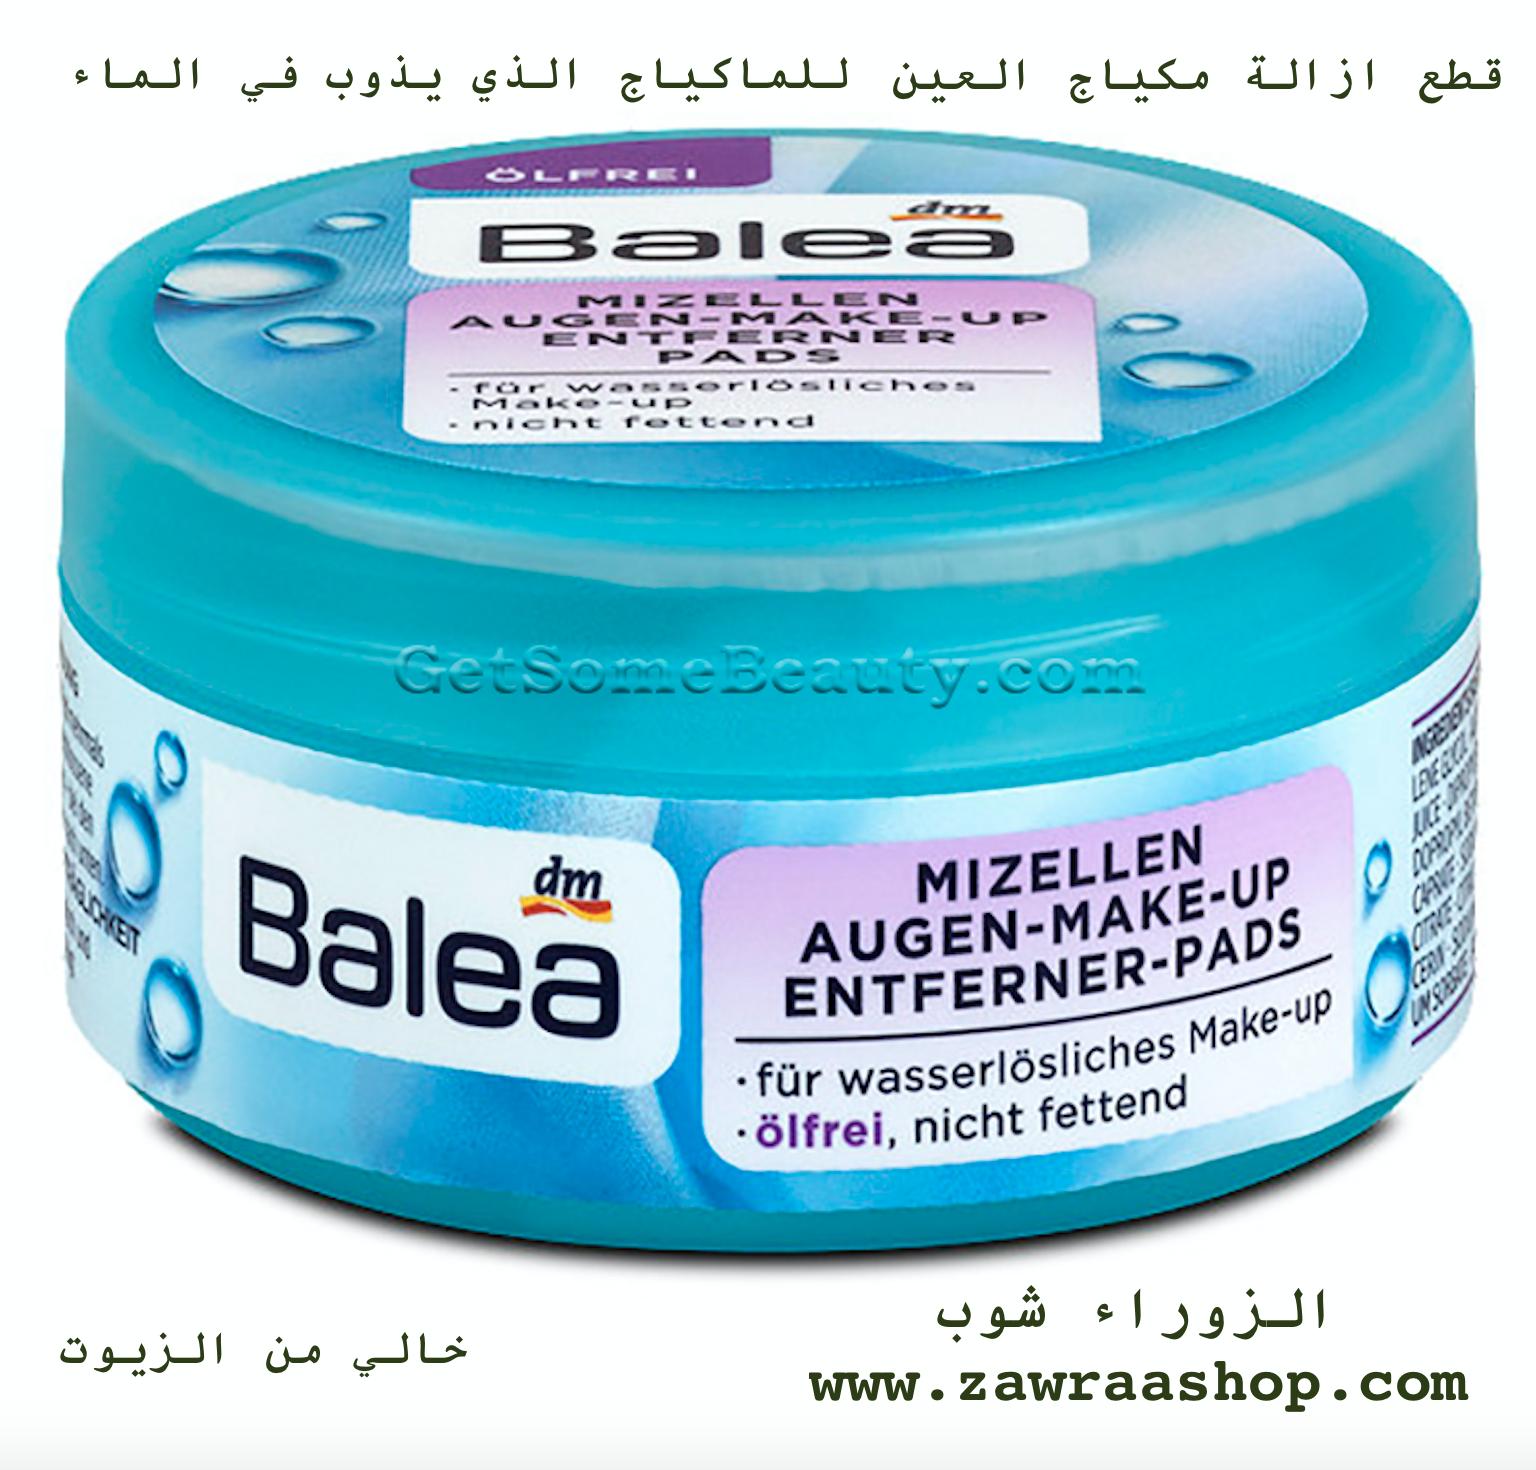 B502 olfrei mizellen augen make up entferner pads مزيل مكياج عيون شرائح خالي من الزيوت 00445